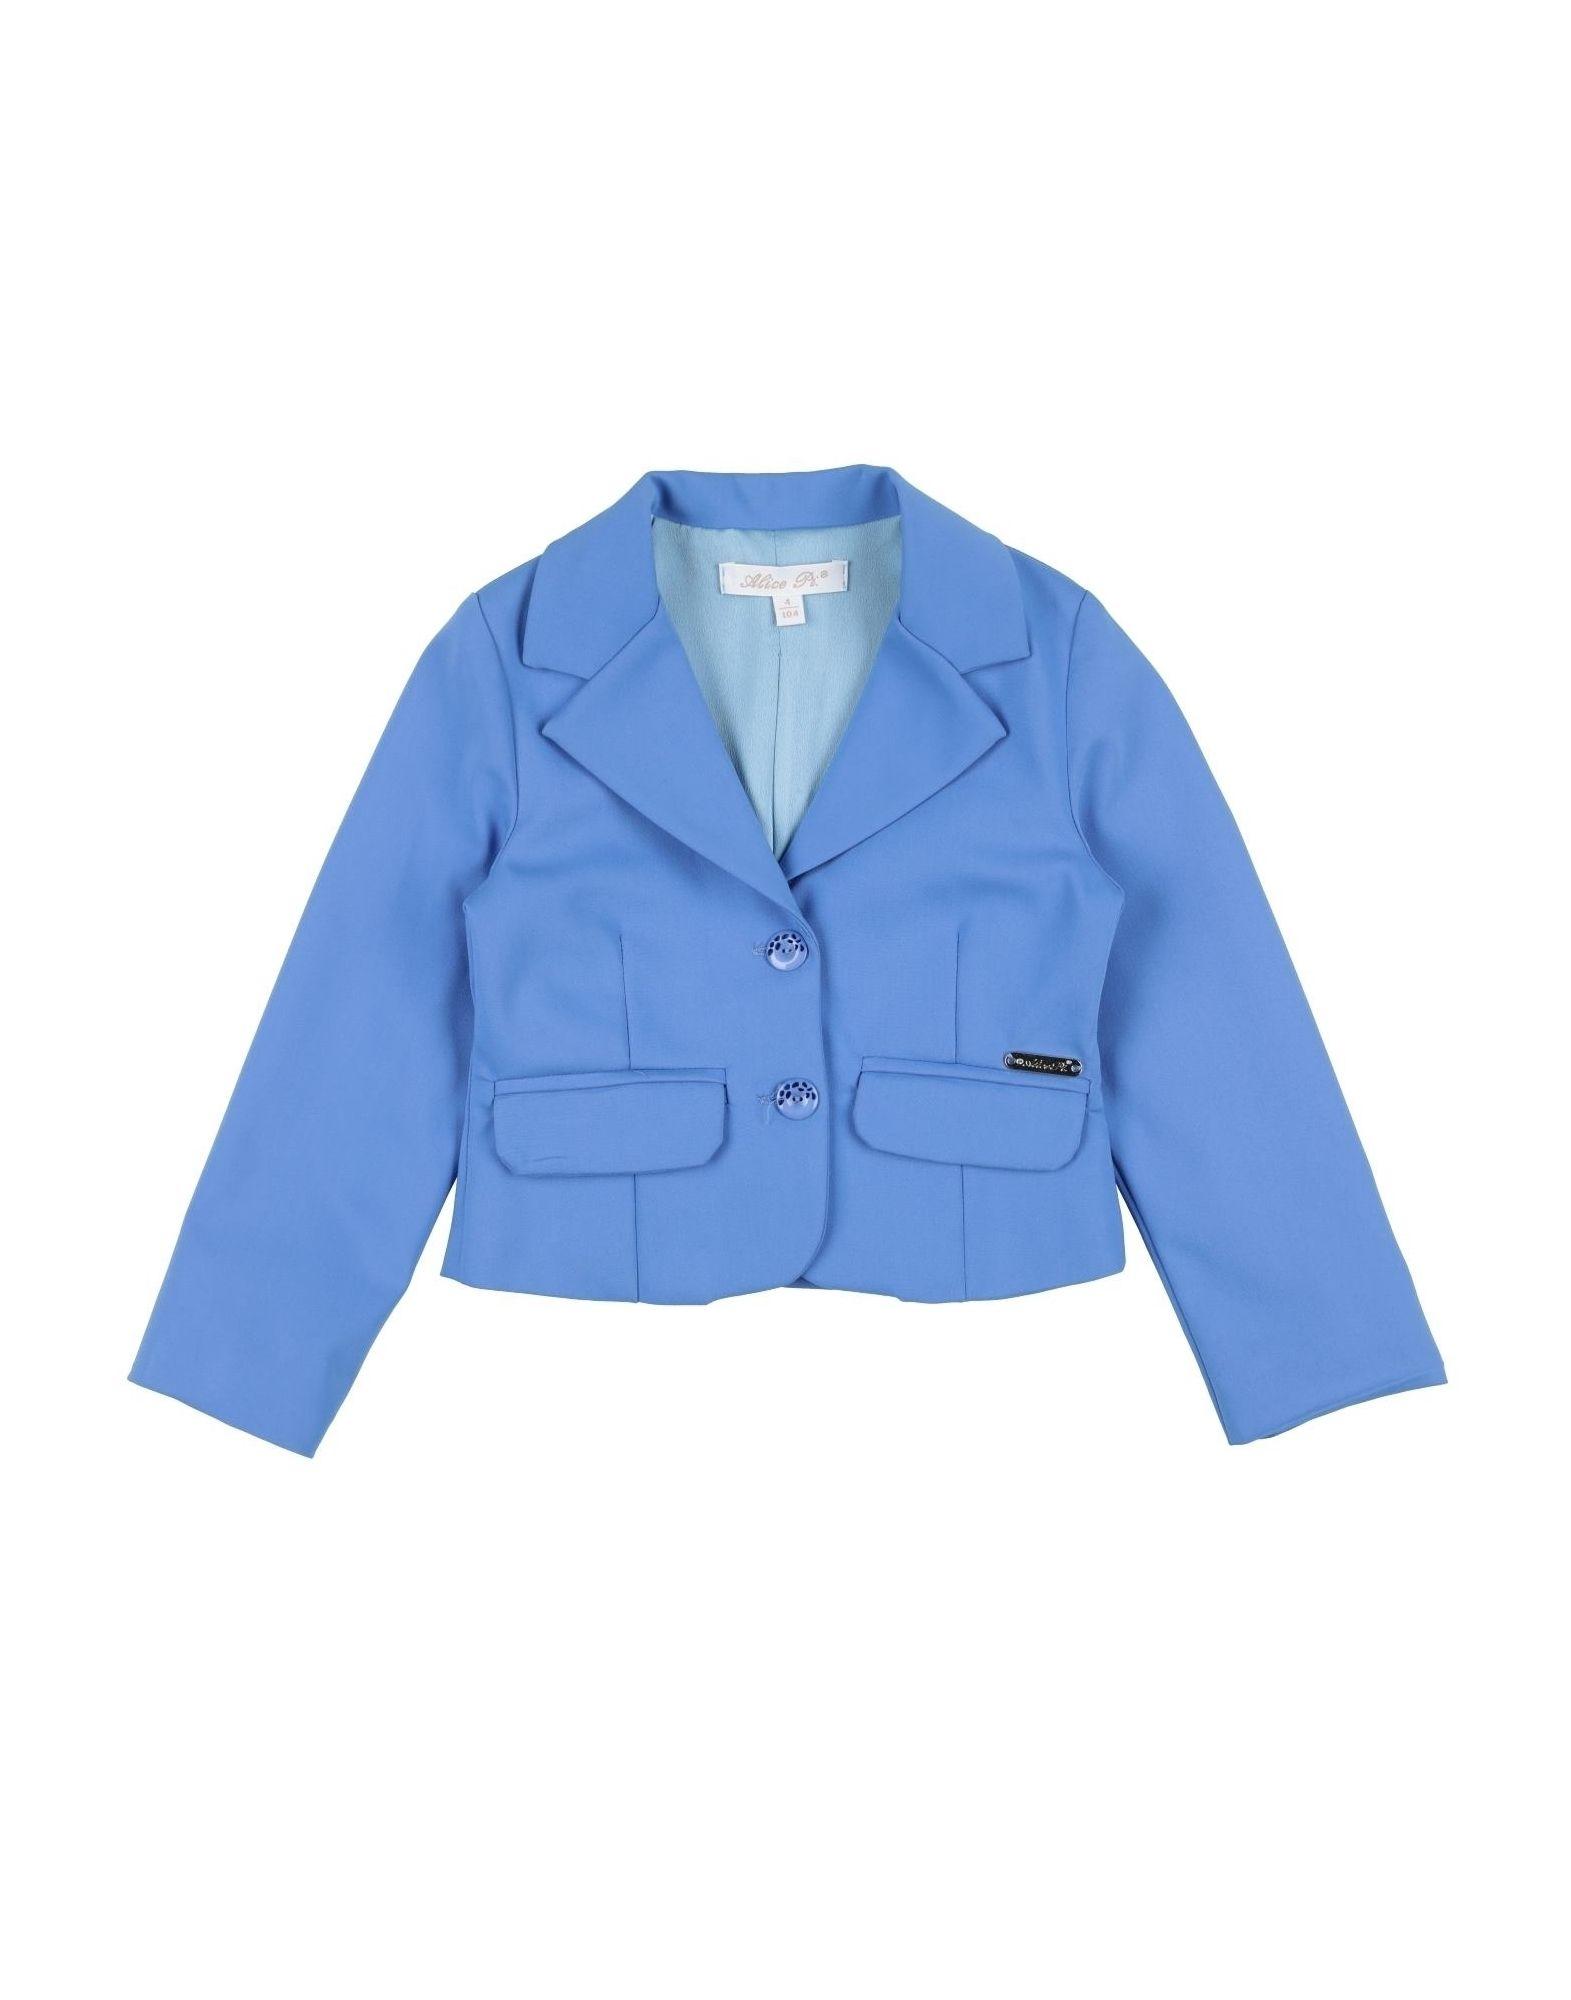 Alice Pi. Kids' Suit Jackets In Blue